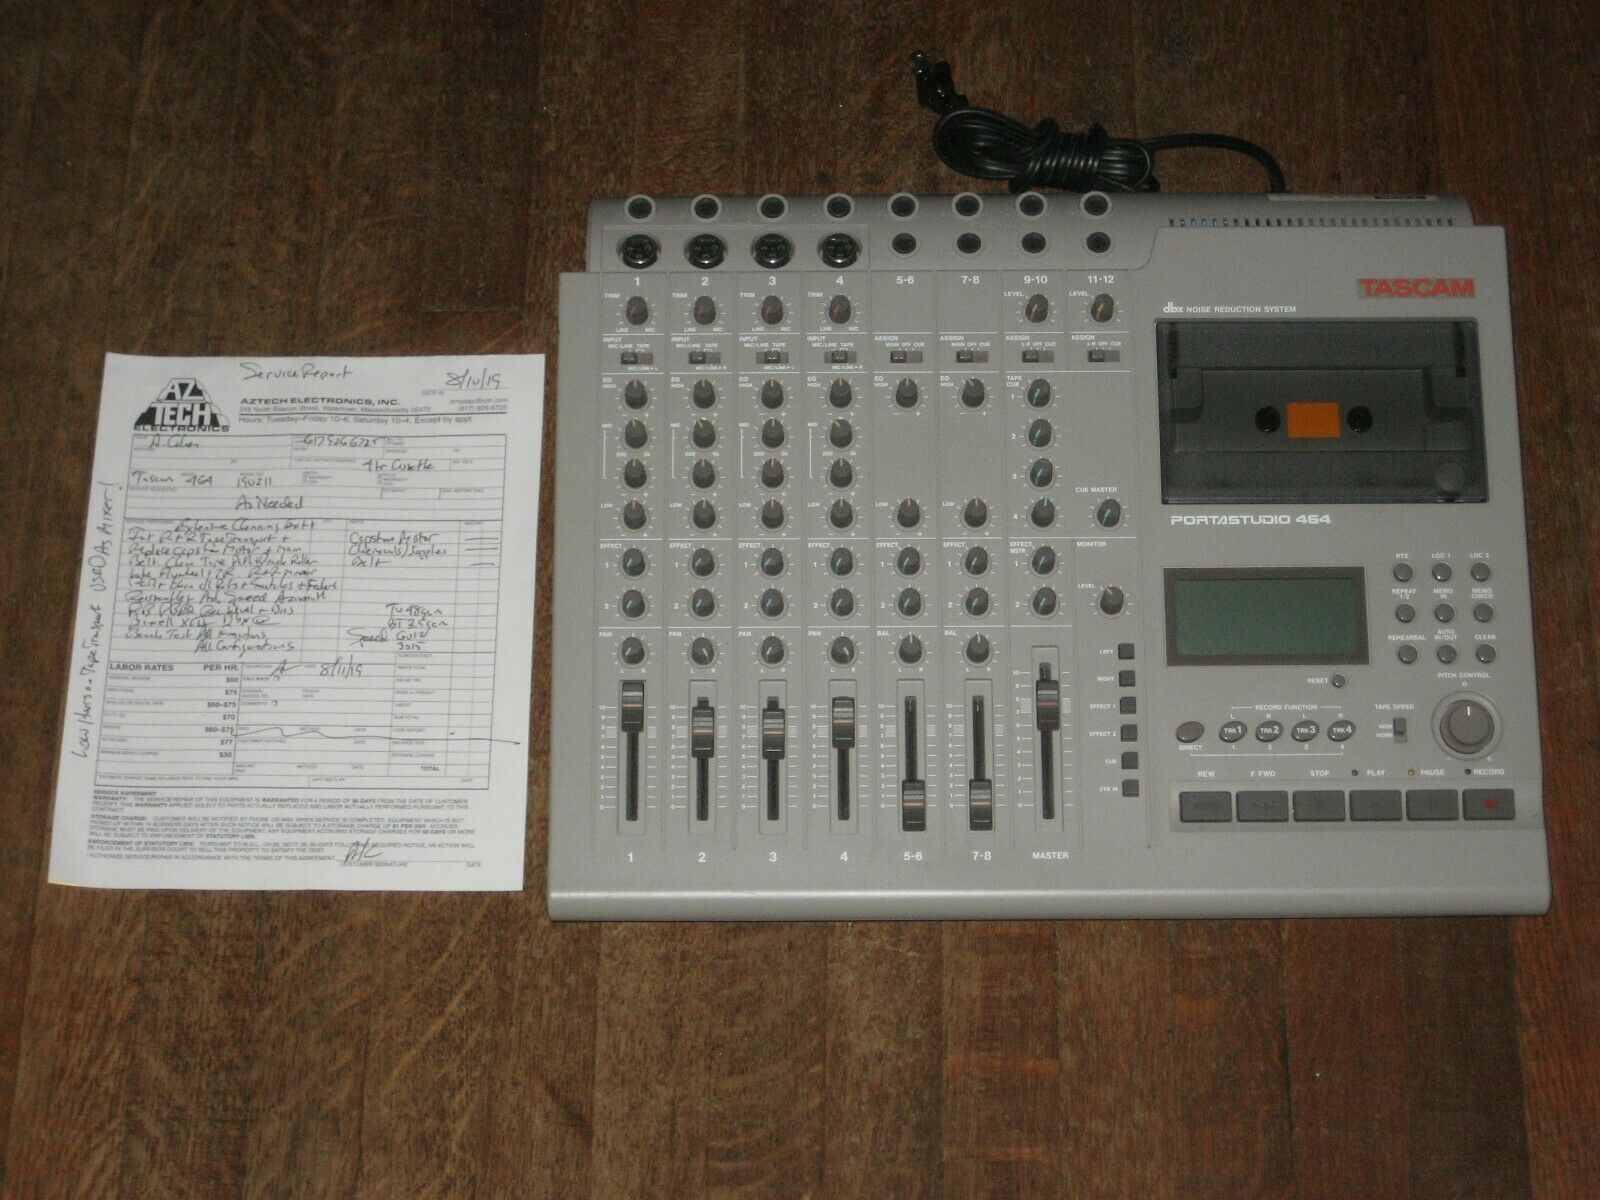 Tascam 464 Portatelier 90 Day Warranty Pro Refurb 4 Track Kassettenrecorder TEAC